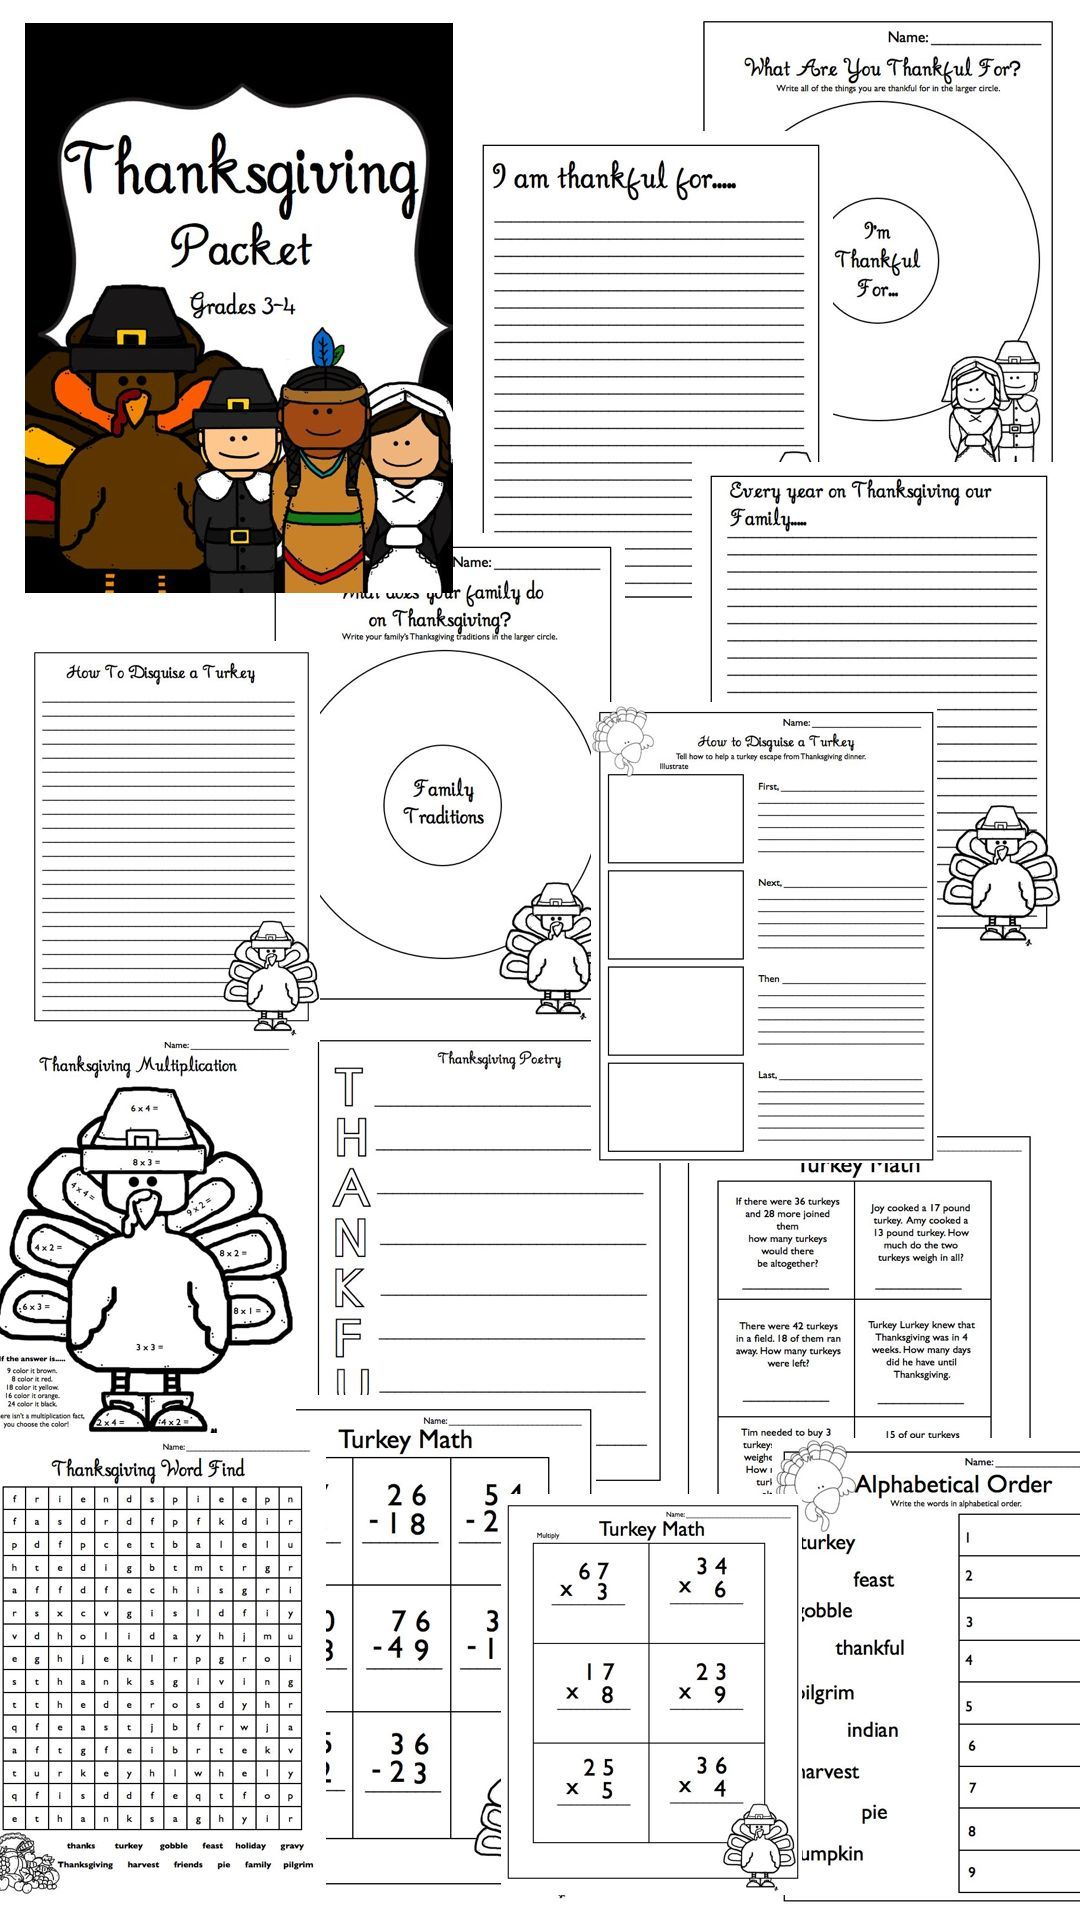 medium resolution of Thanksgiving Packet Grades 3-4 ELA \u0026 Math   Thanksgiving classroom  activities